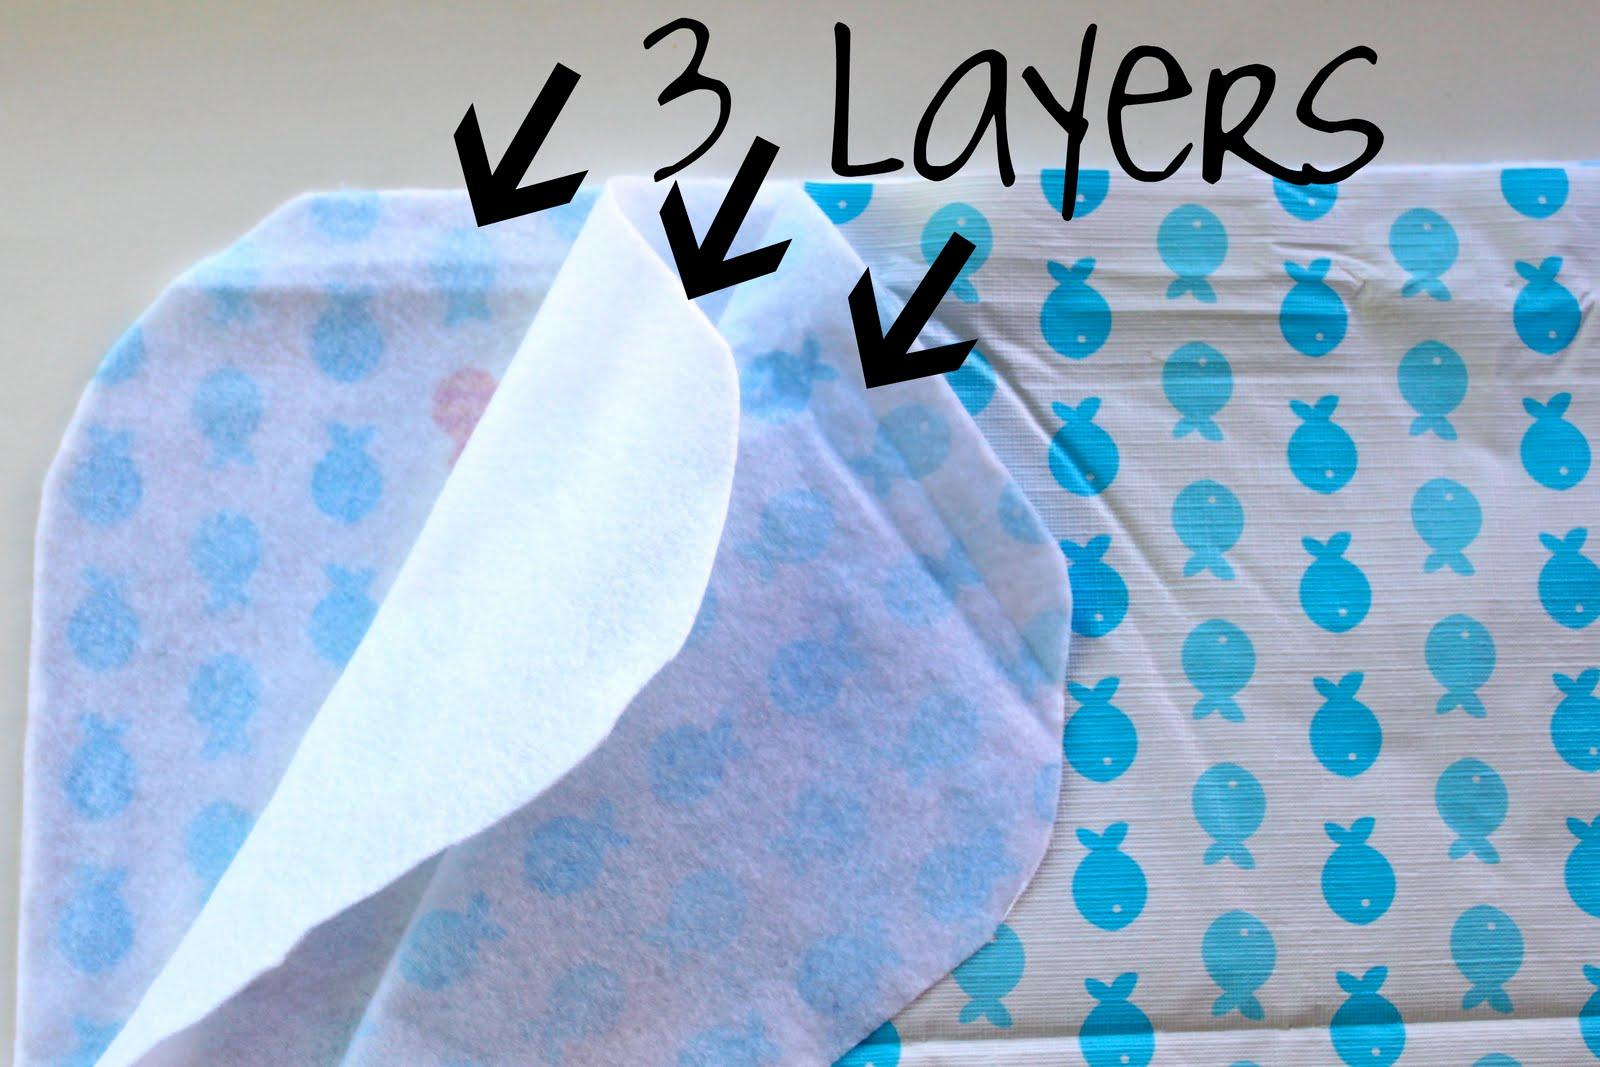 elastic tablecloths clear vinyl tablecloth vinyl tablecloths - Vinyl Tablecloths